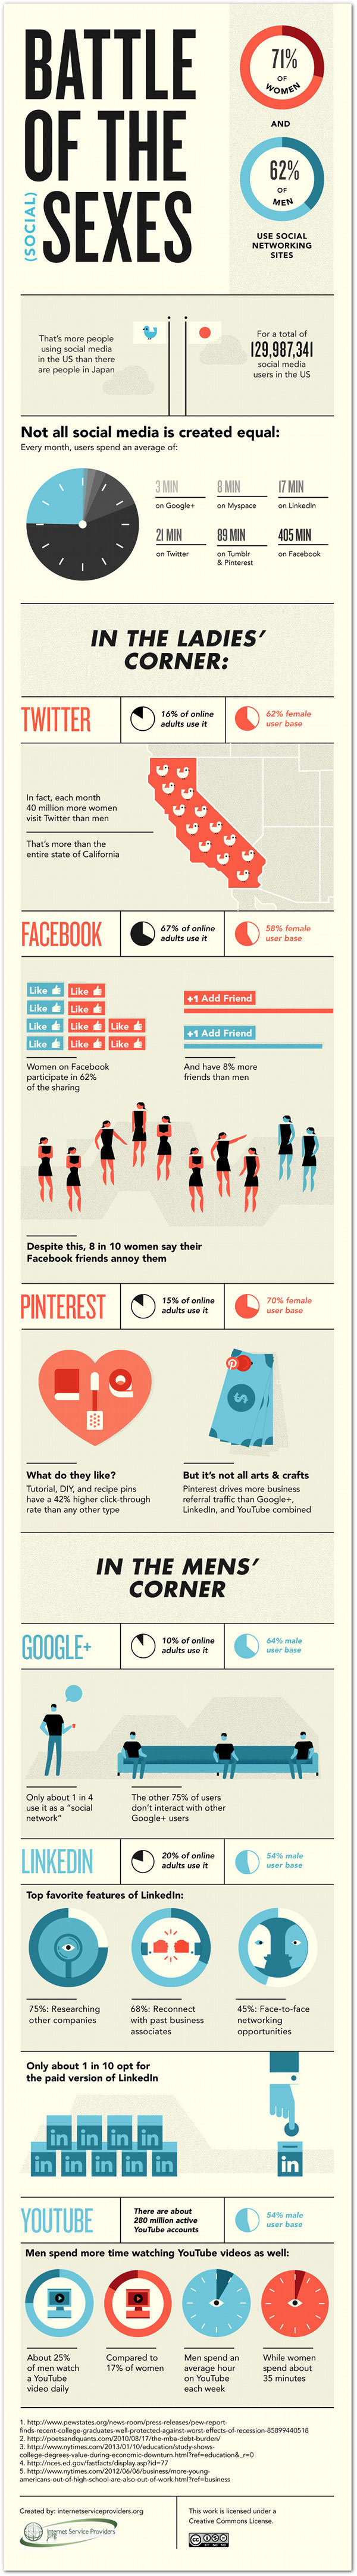 social media and gender